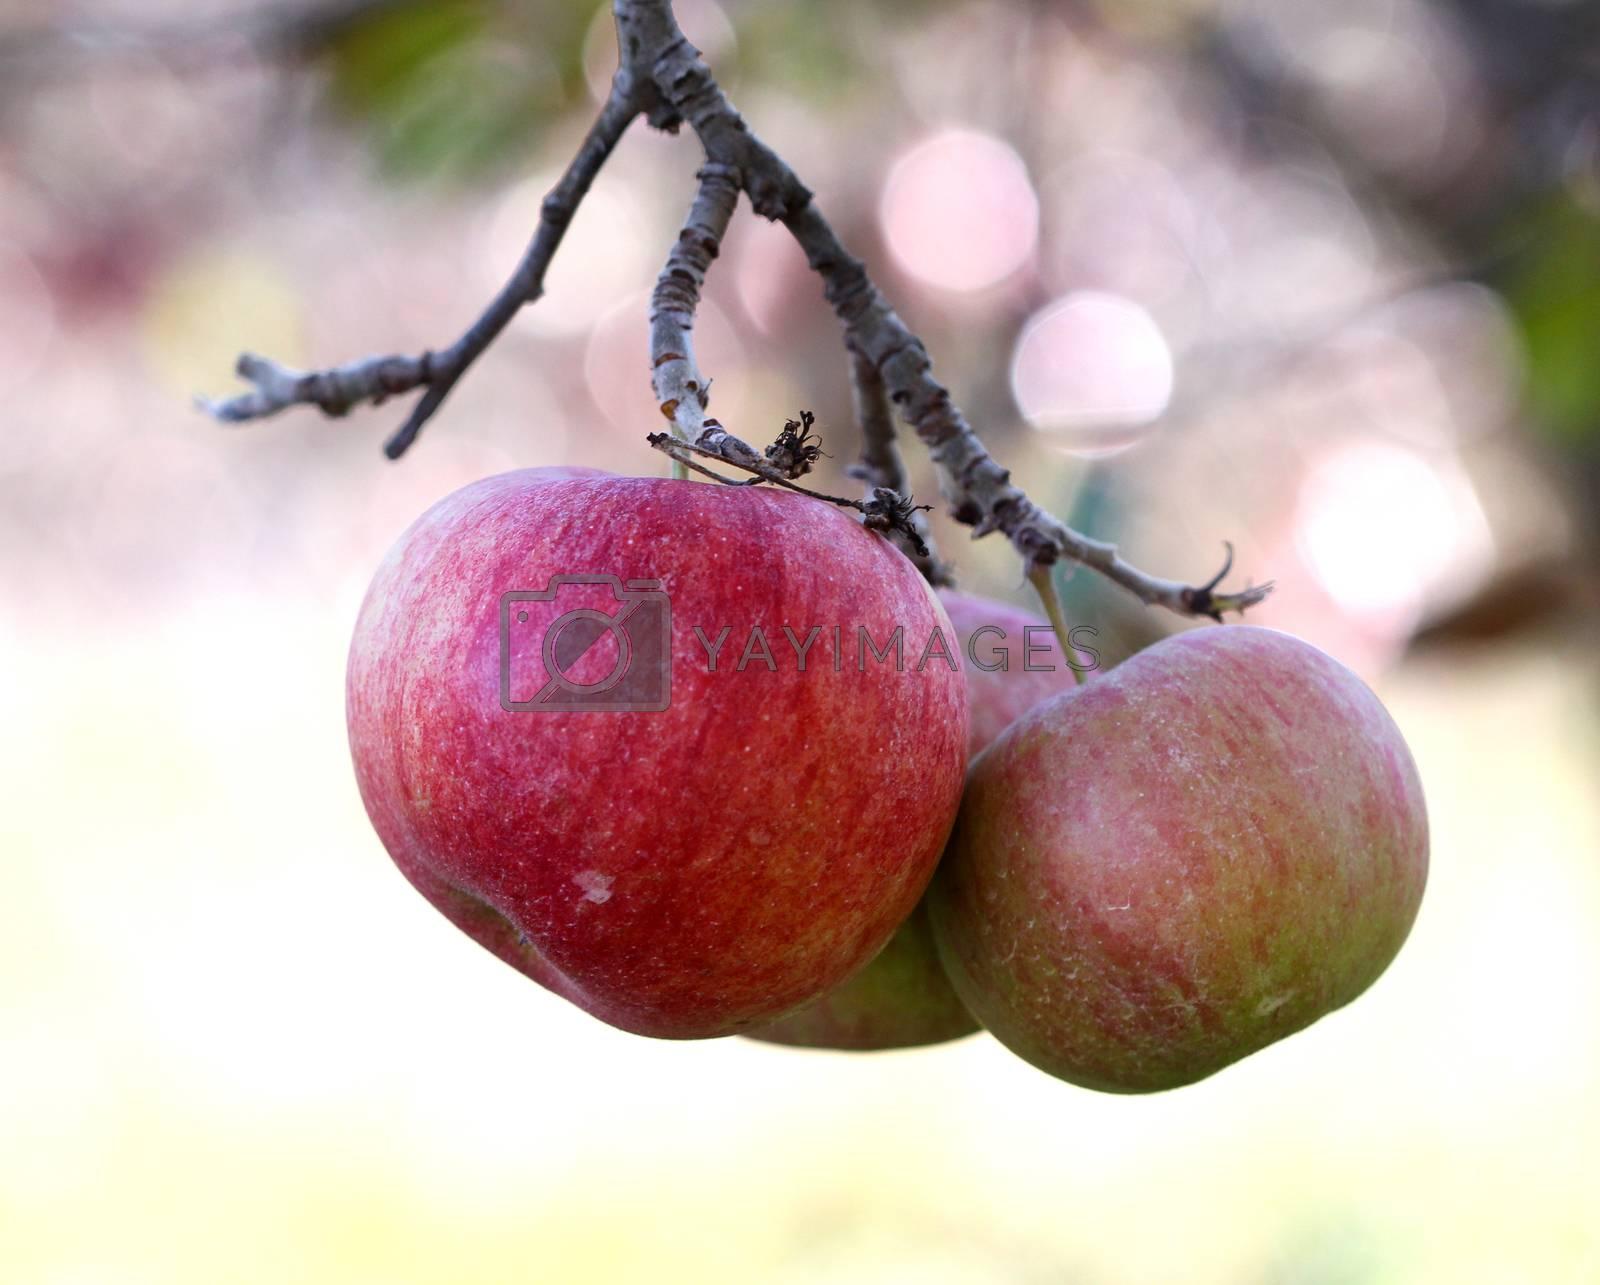 Apples on tree on november morning by nehru